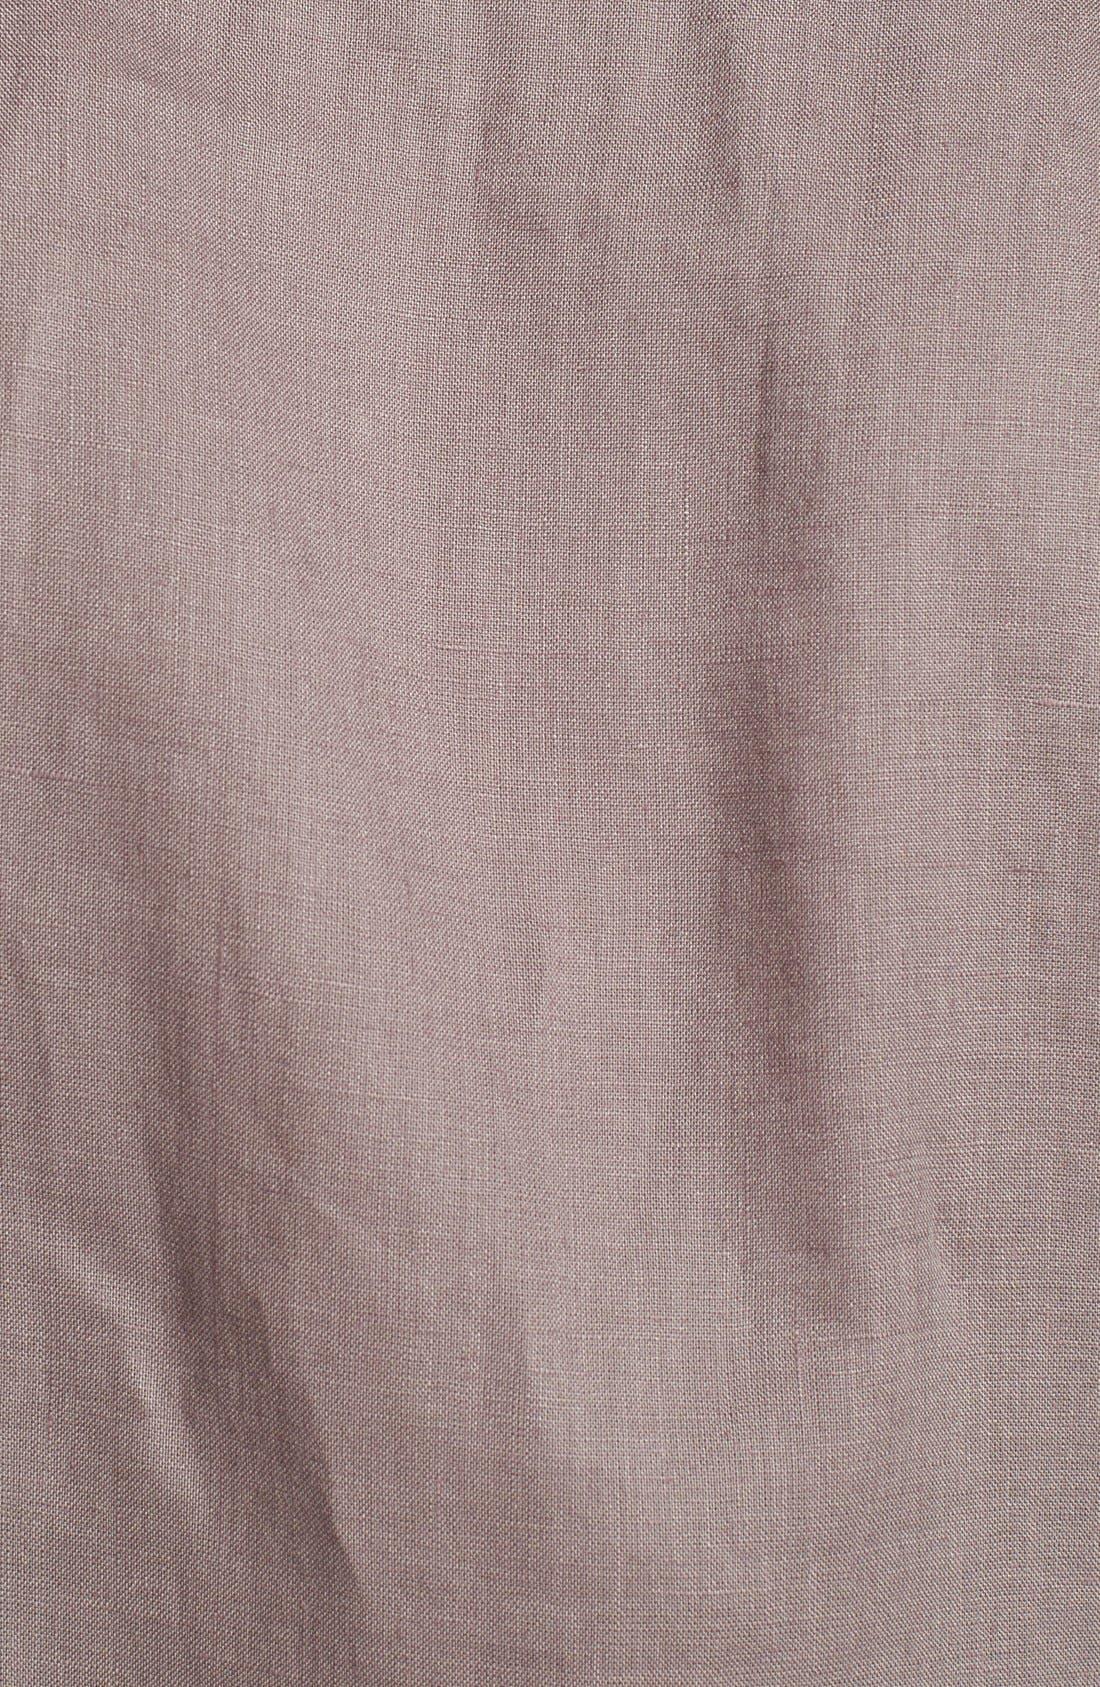 'Caroubier' Linen Shirt,                             Alternate thumbnail 43, color,